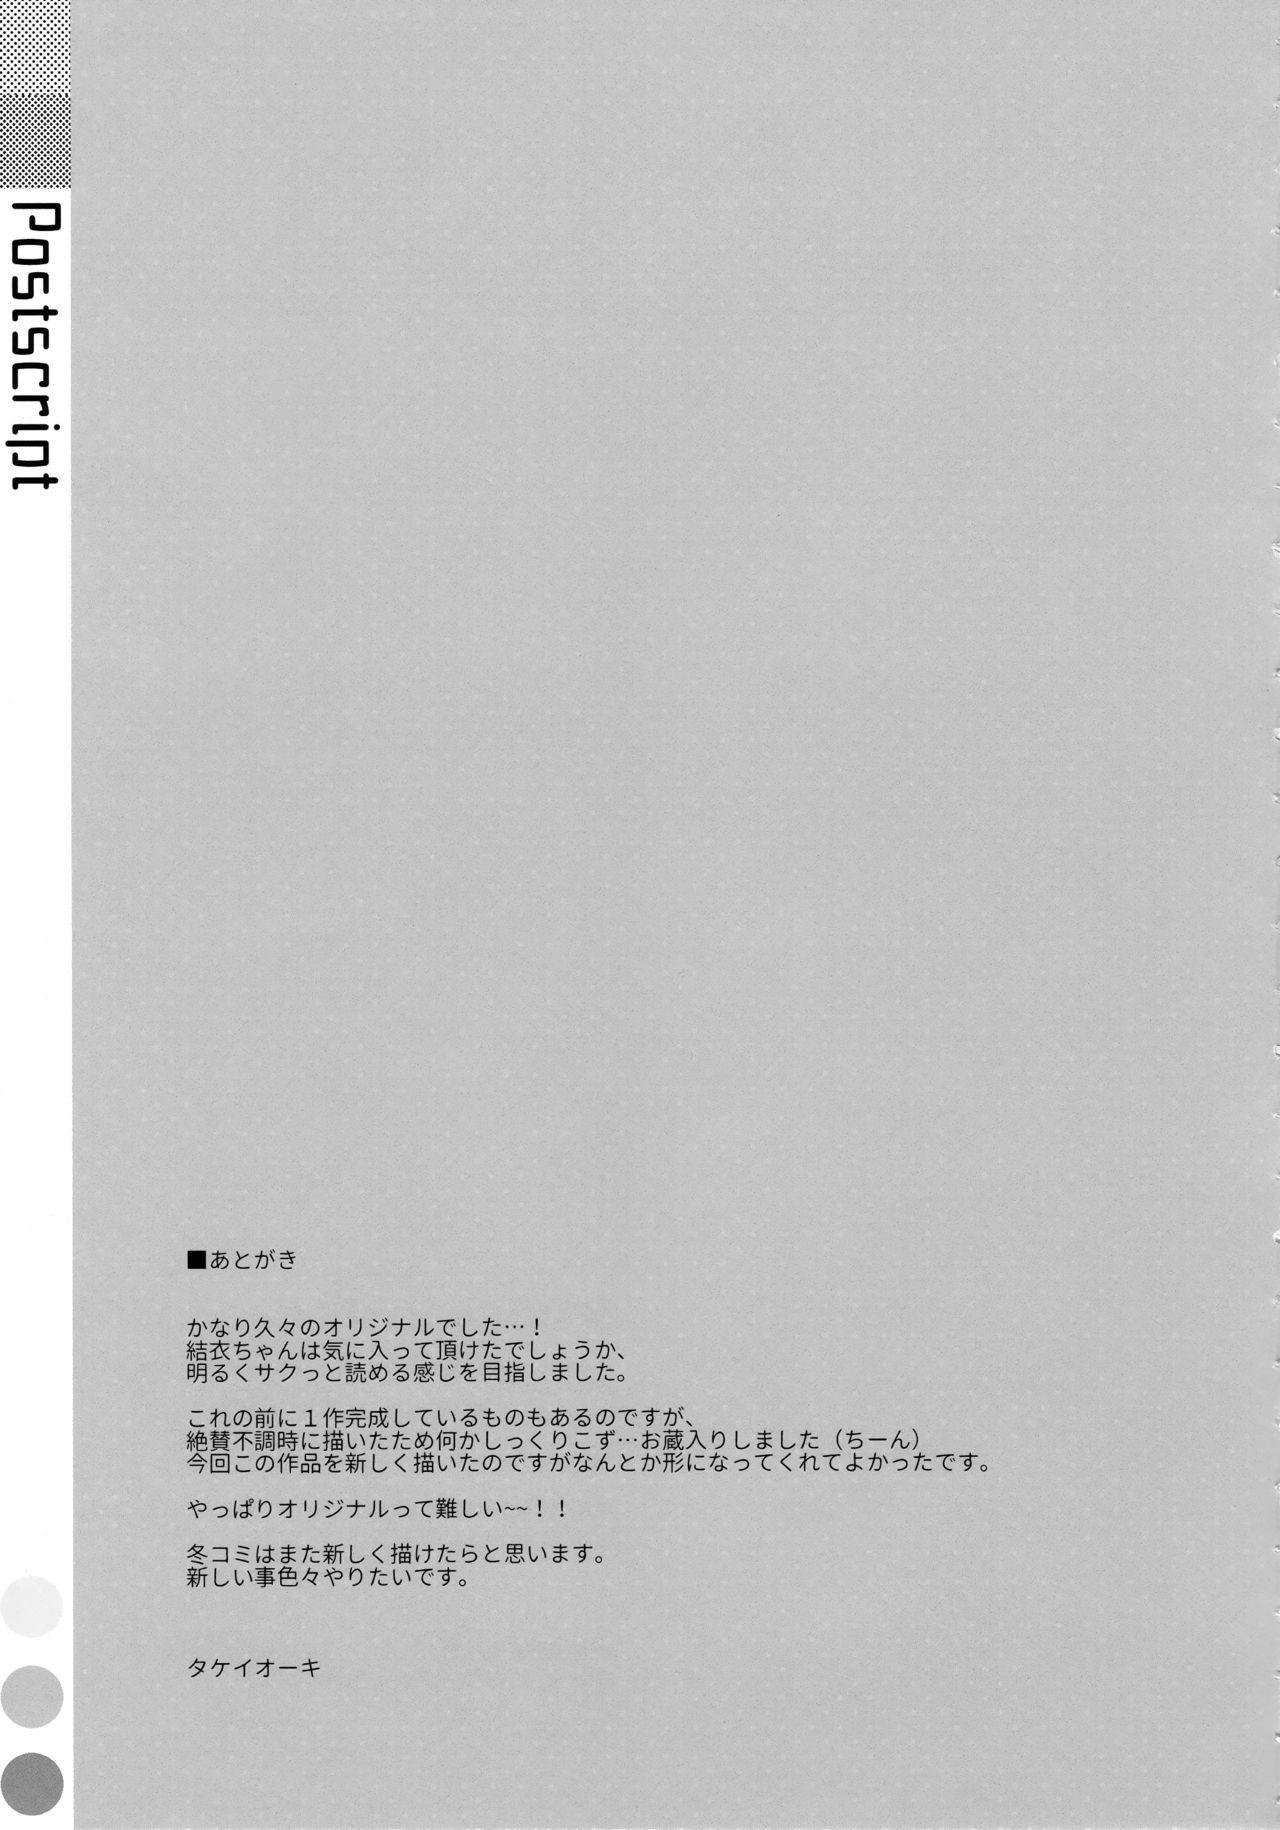 (C96) [TIES (Takei Ooki)] Neteiru (?) Onii-chan ni Iroiro Shitai! 23